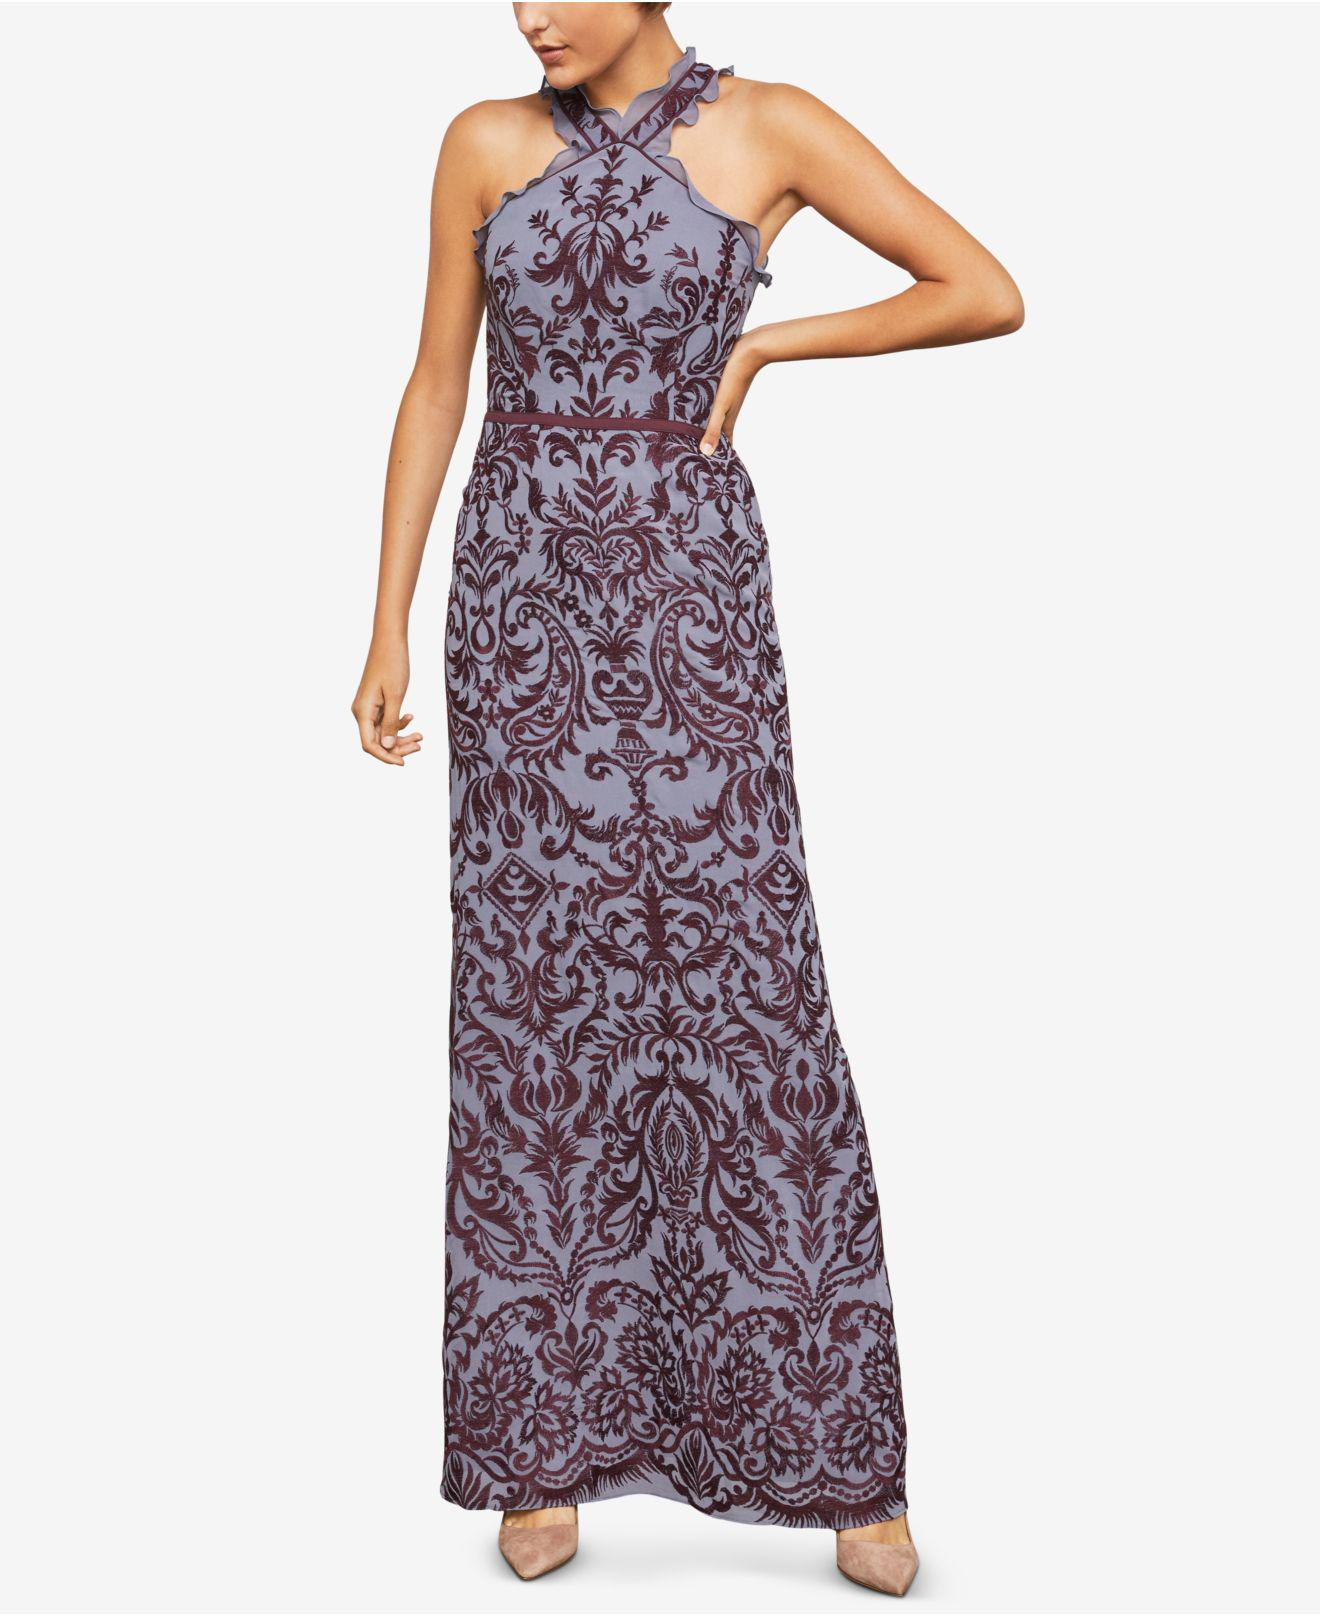 65d25622066 BCBGMAXAZRIA Embroidered Chiffon Halter Gown in Purple - Lyst